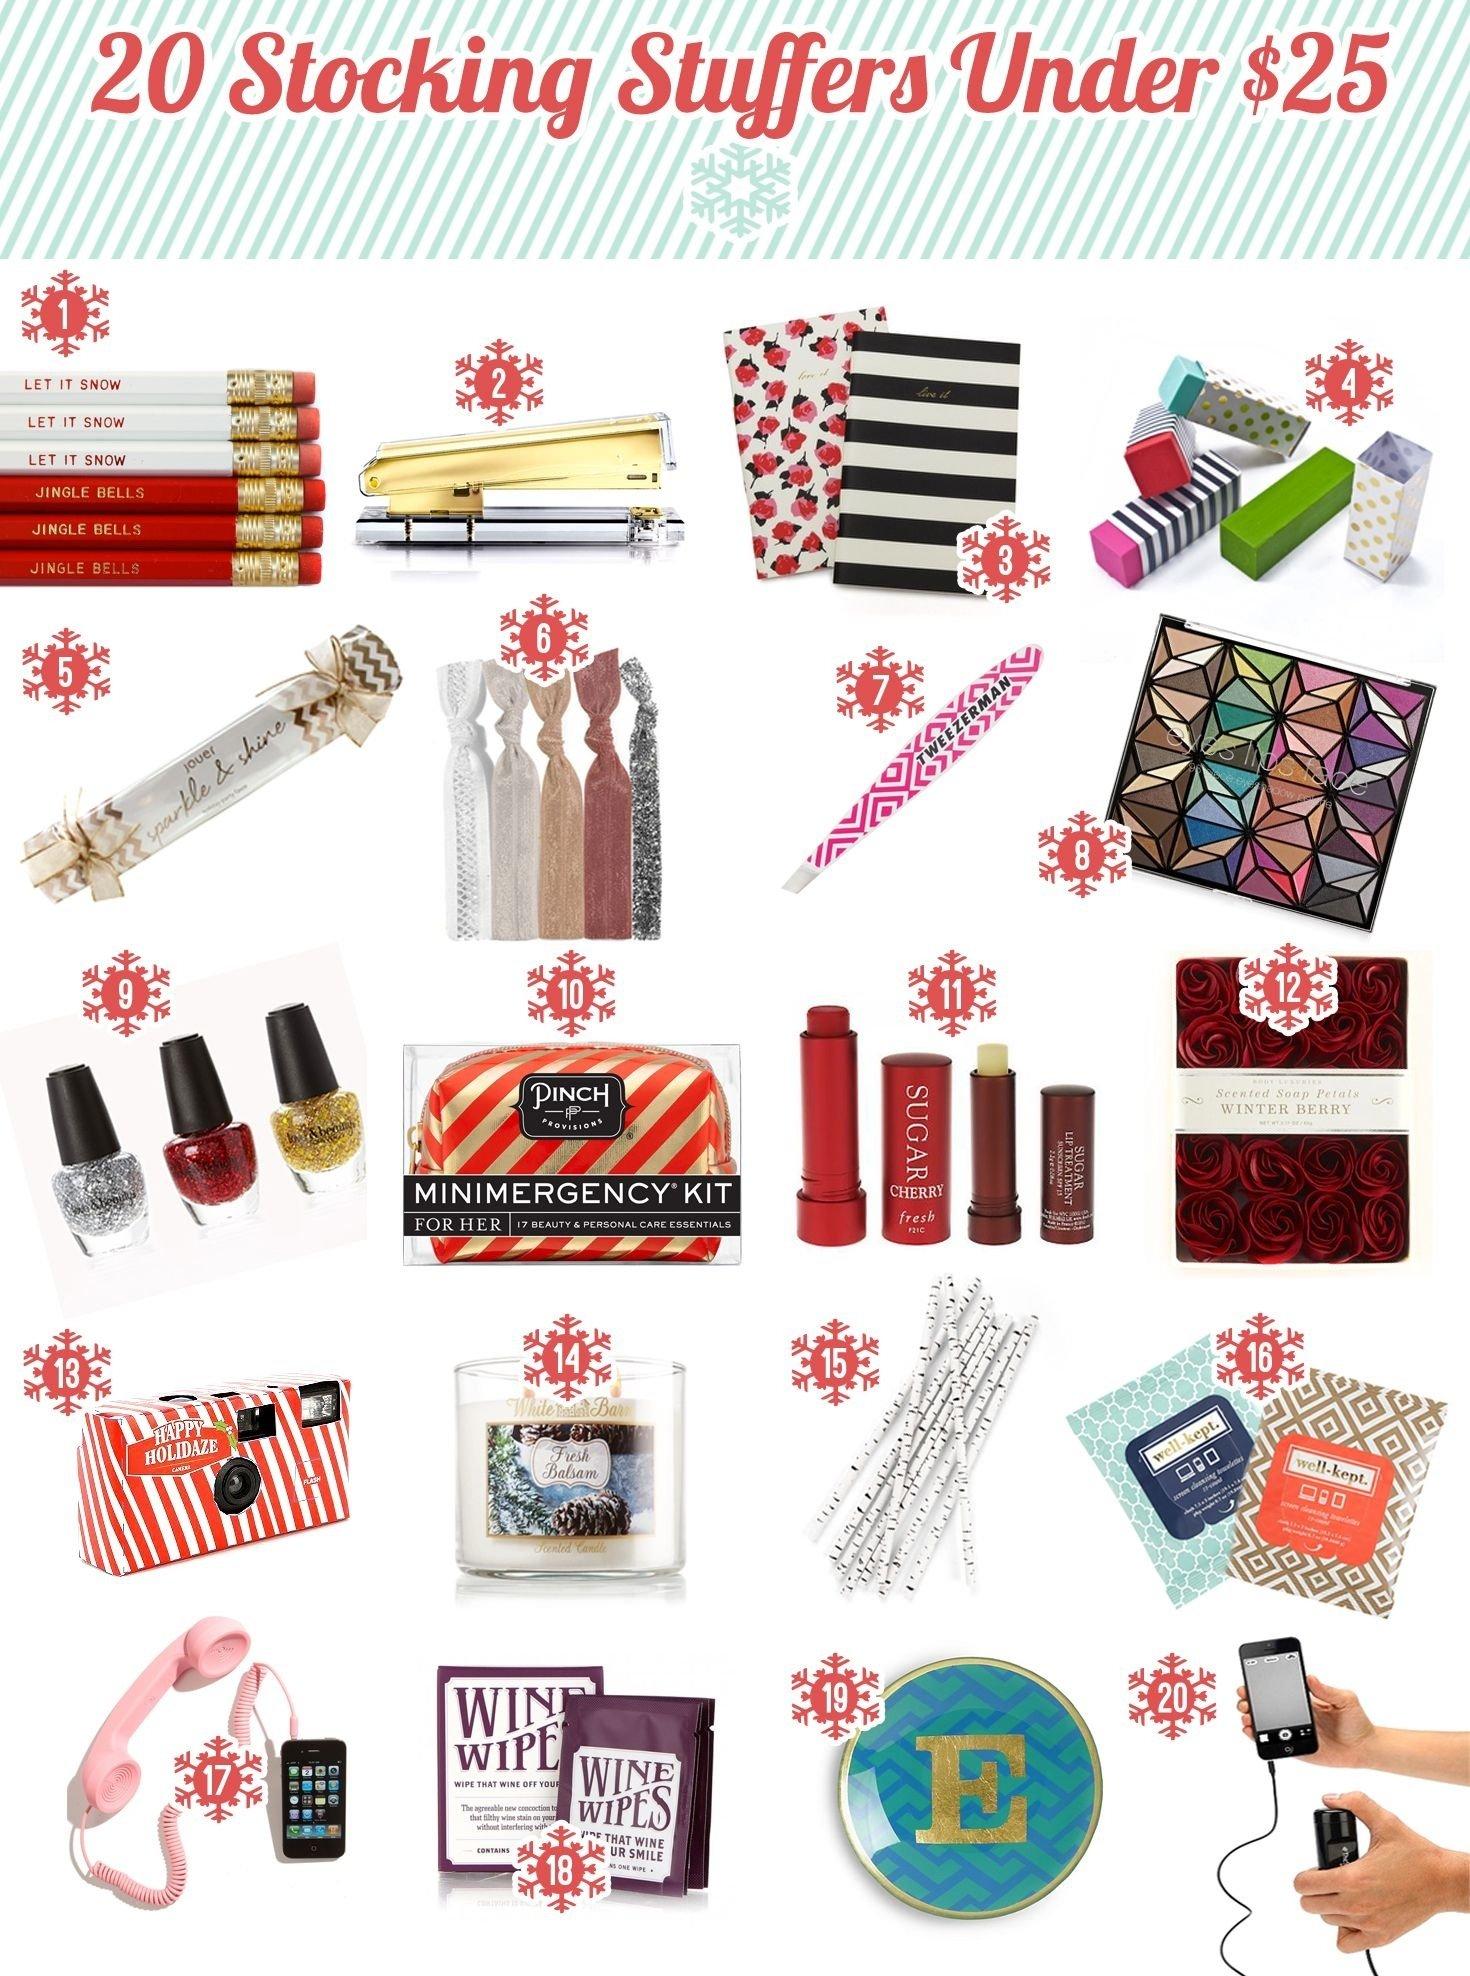 10 Unique Great Secret Santa Gift Ideas 2013 holiday gift guide secret santa gift ideas under 25 most are 5